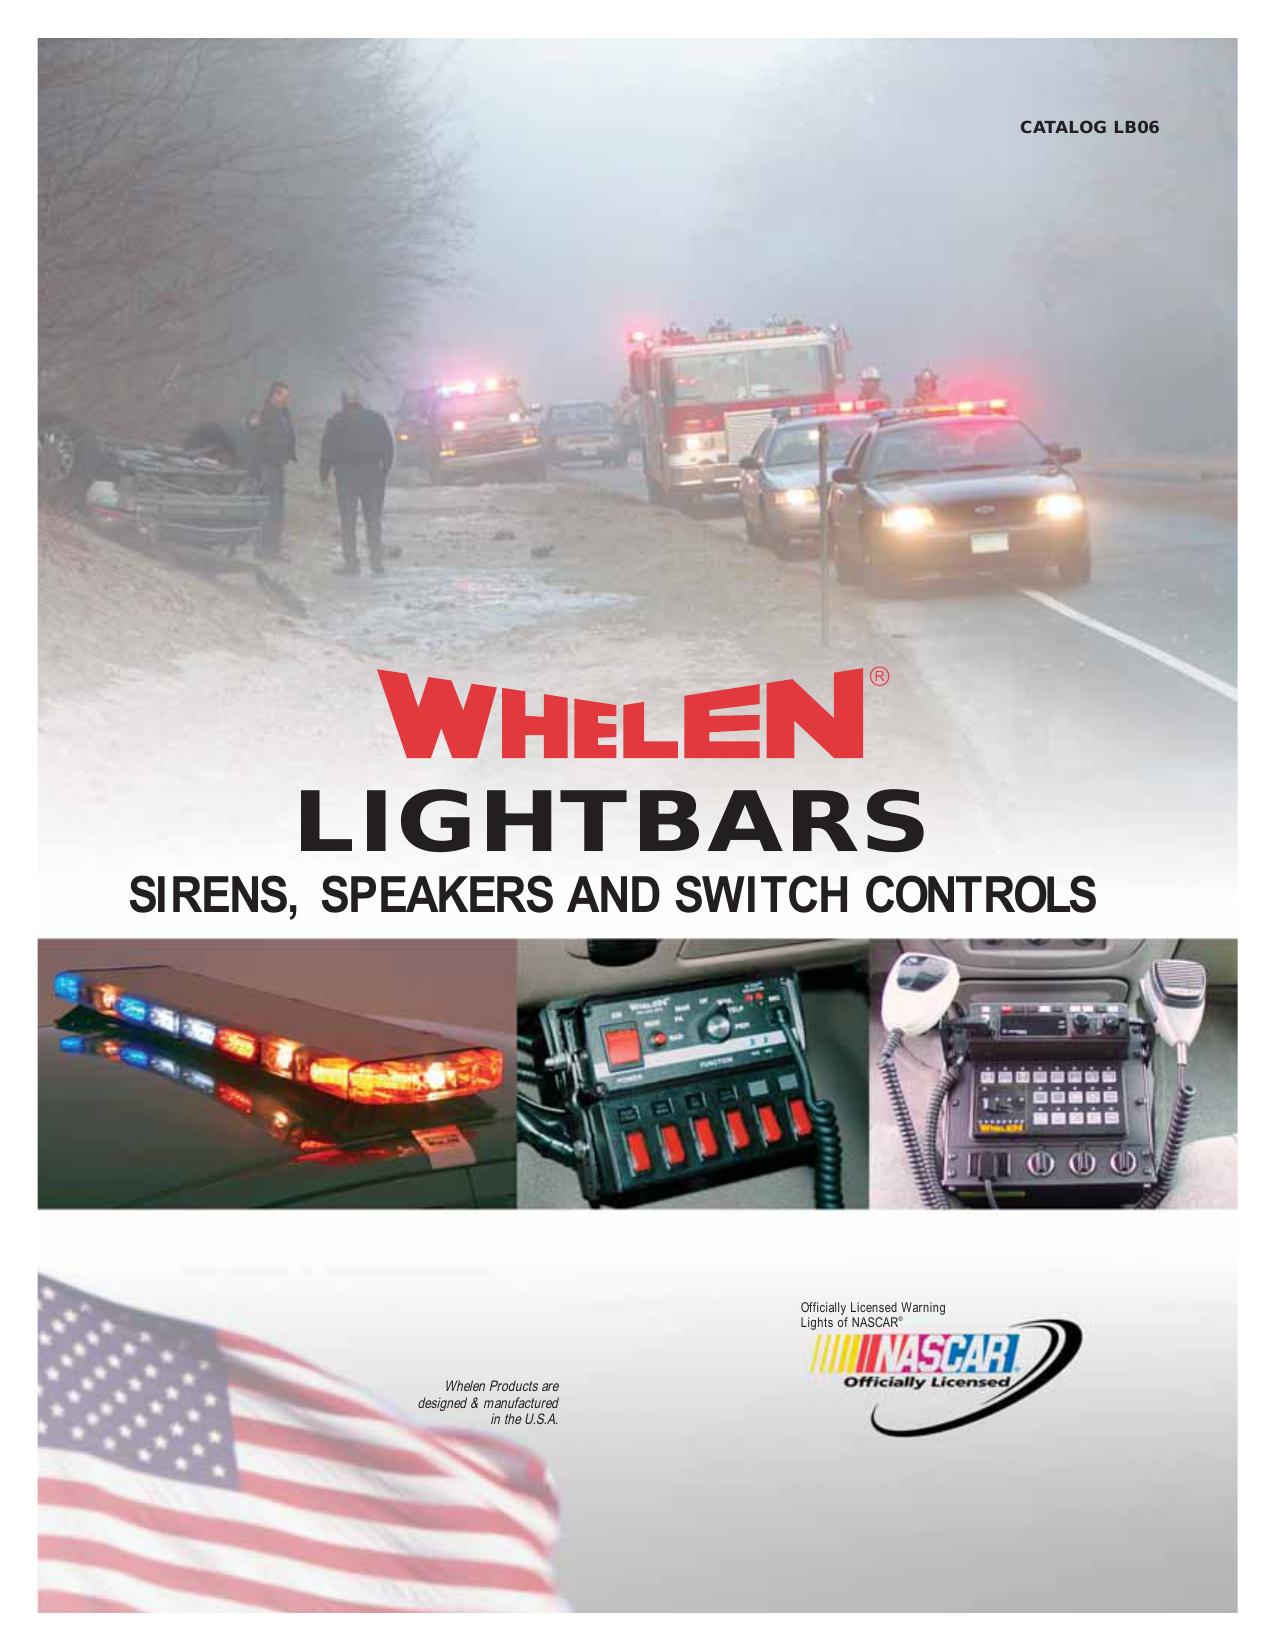 Whelen Liberty Patriot Mirror Beam 500 Series Halogen Alley Takedown Flasher